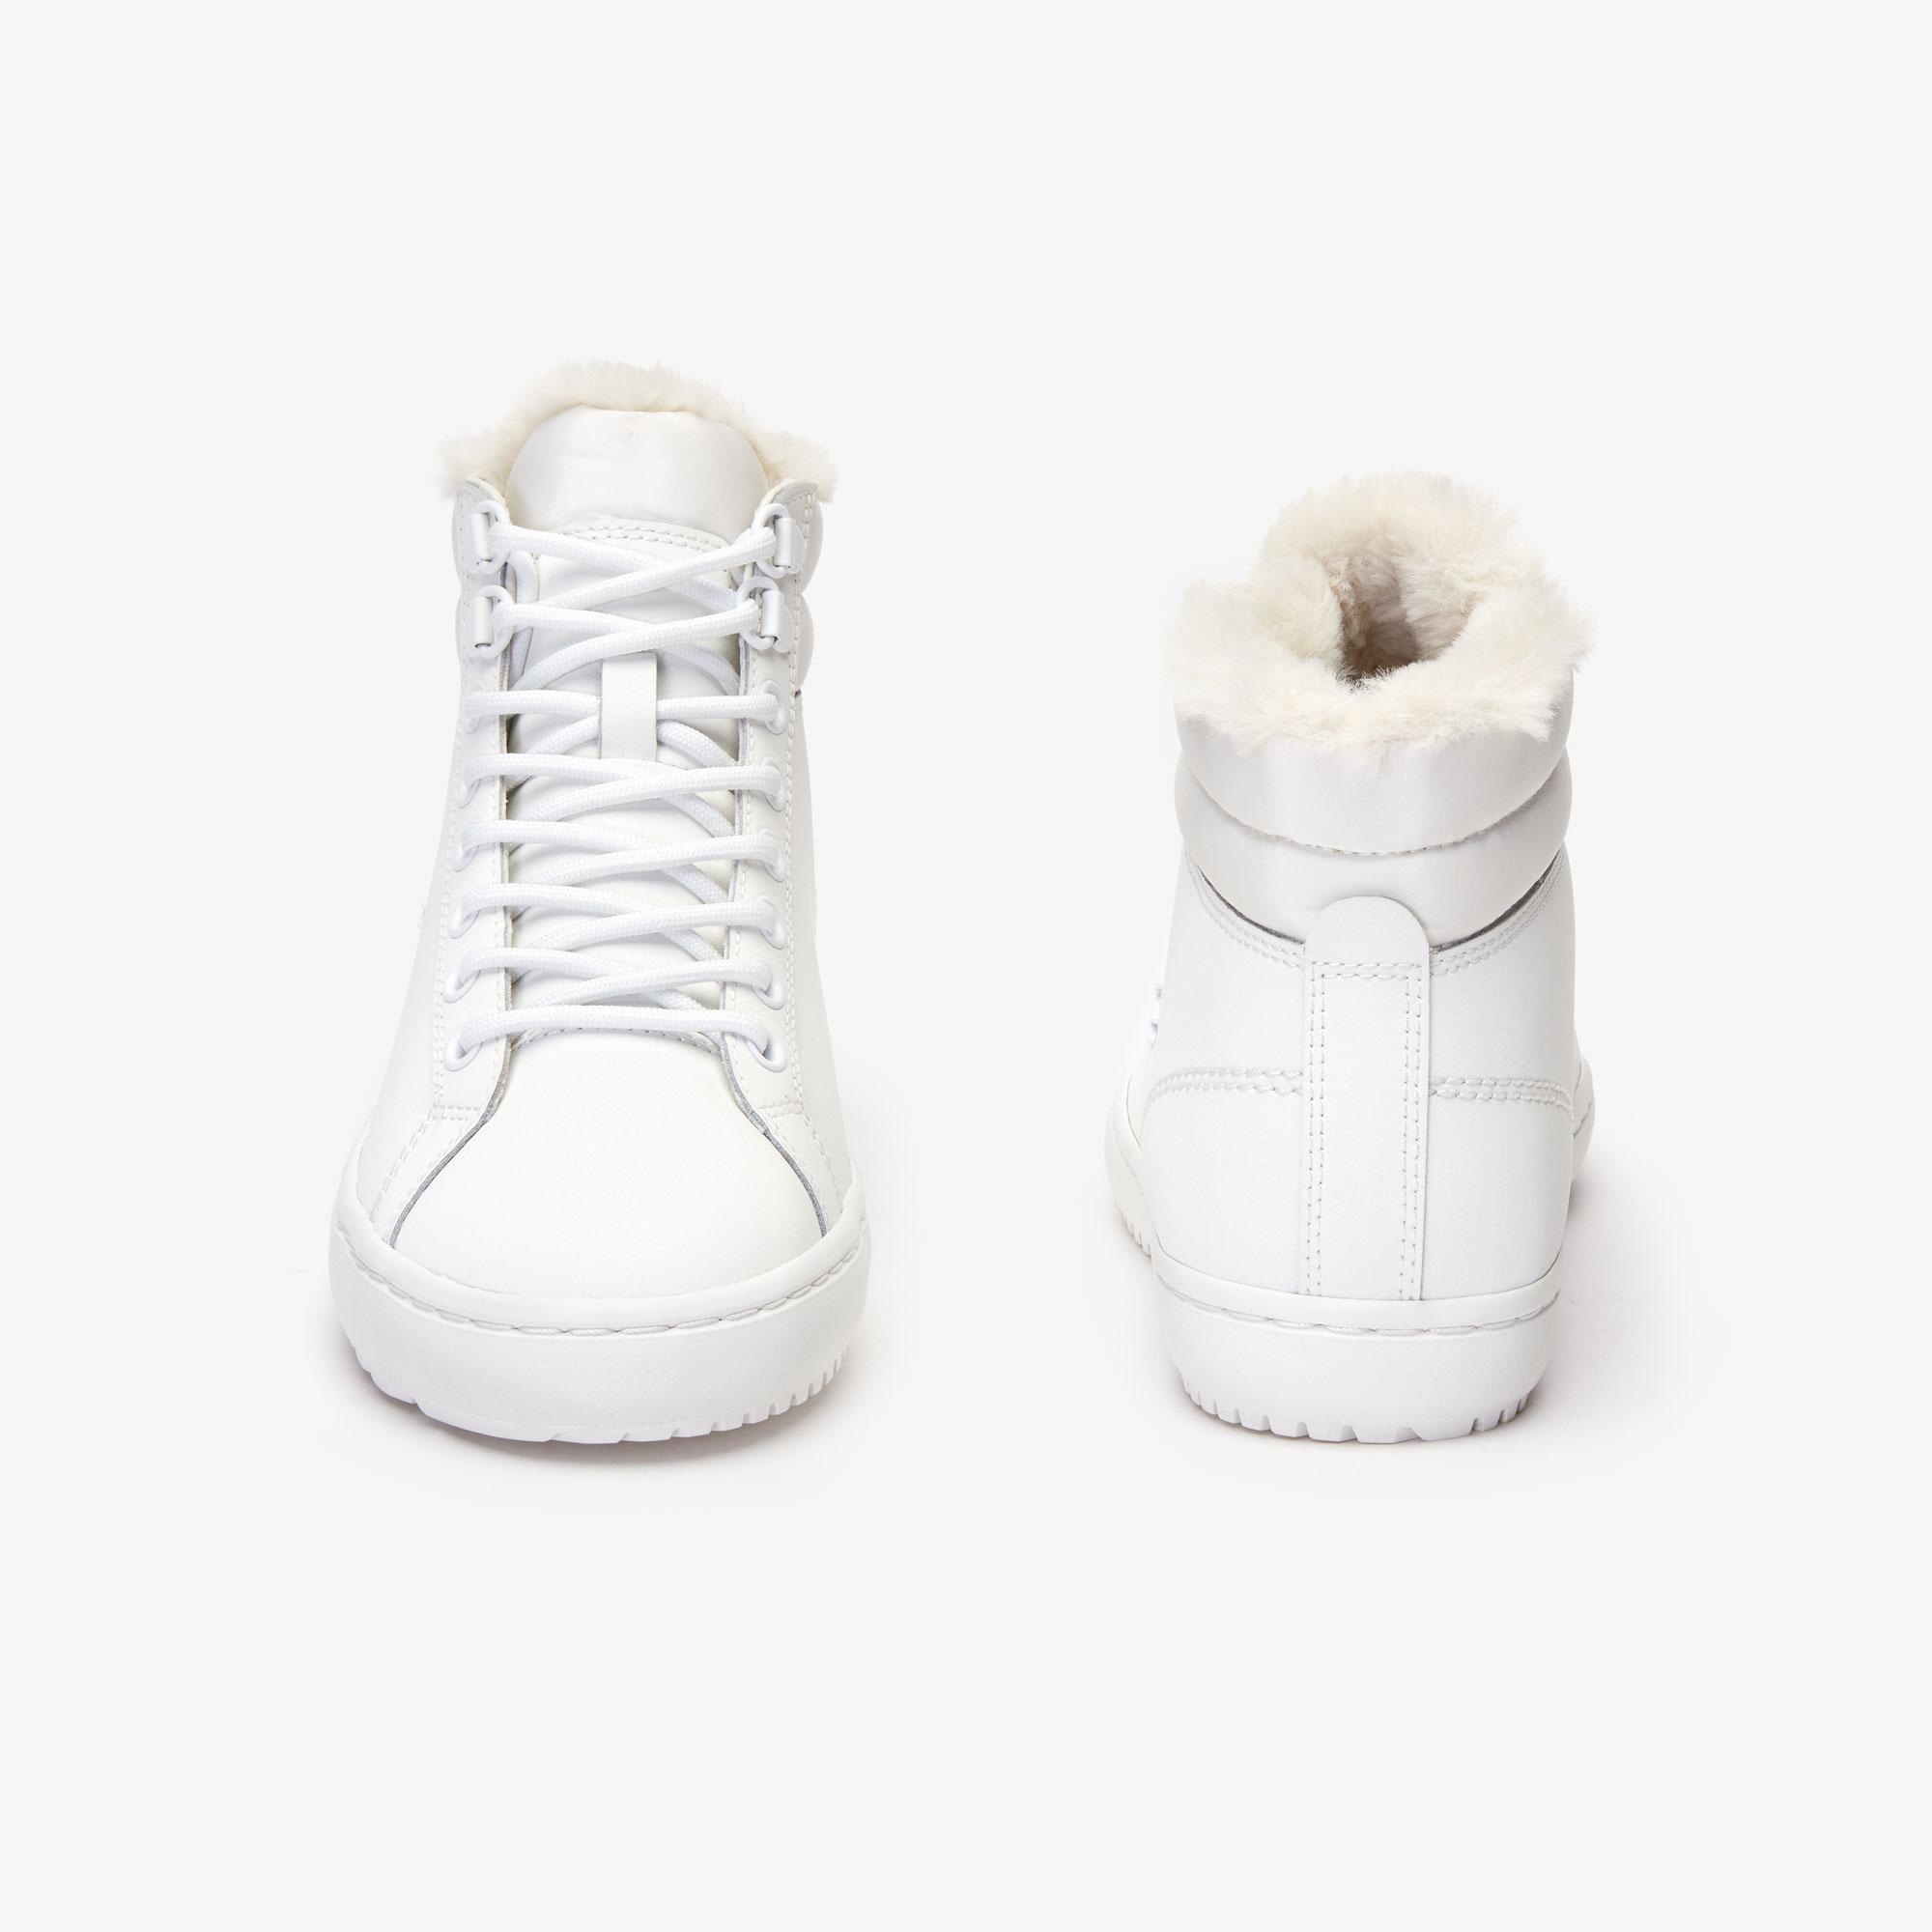 Lacoste Straightset Thermo 4191 Cfa Kadın Beyaz Bot